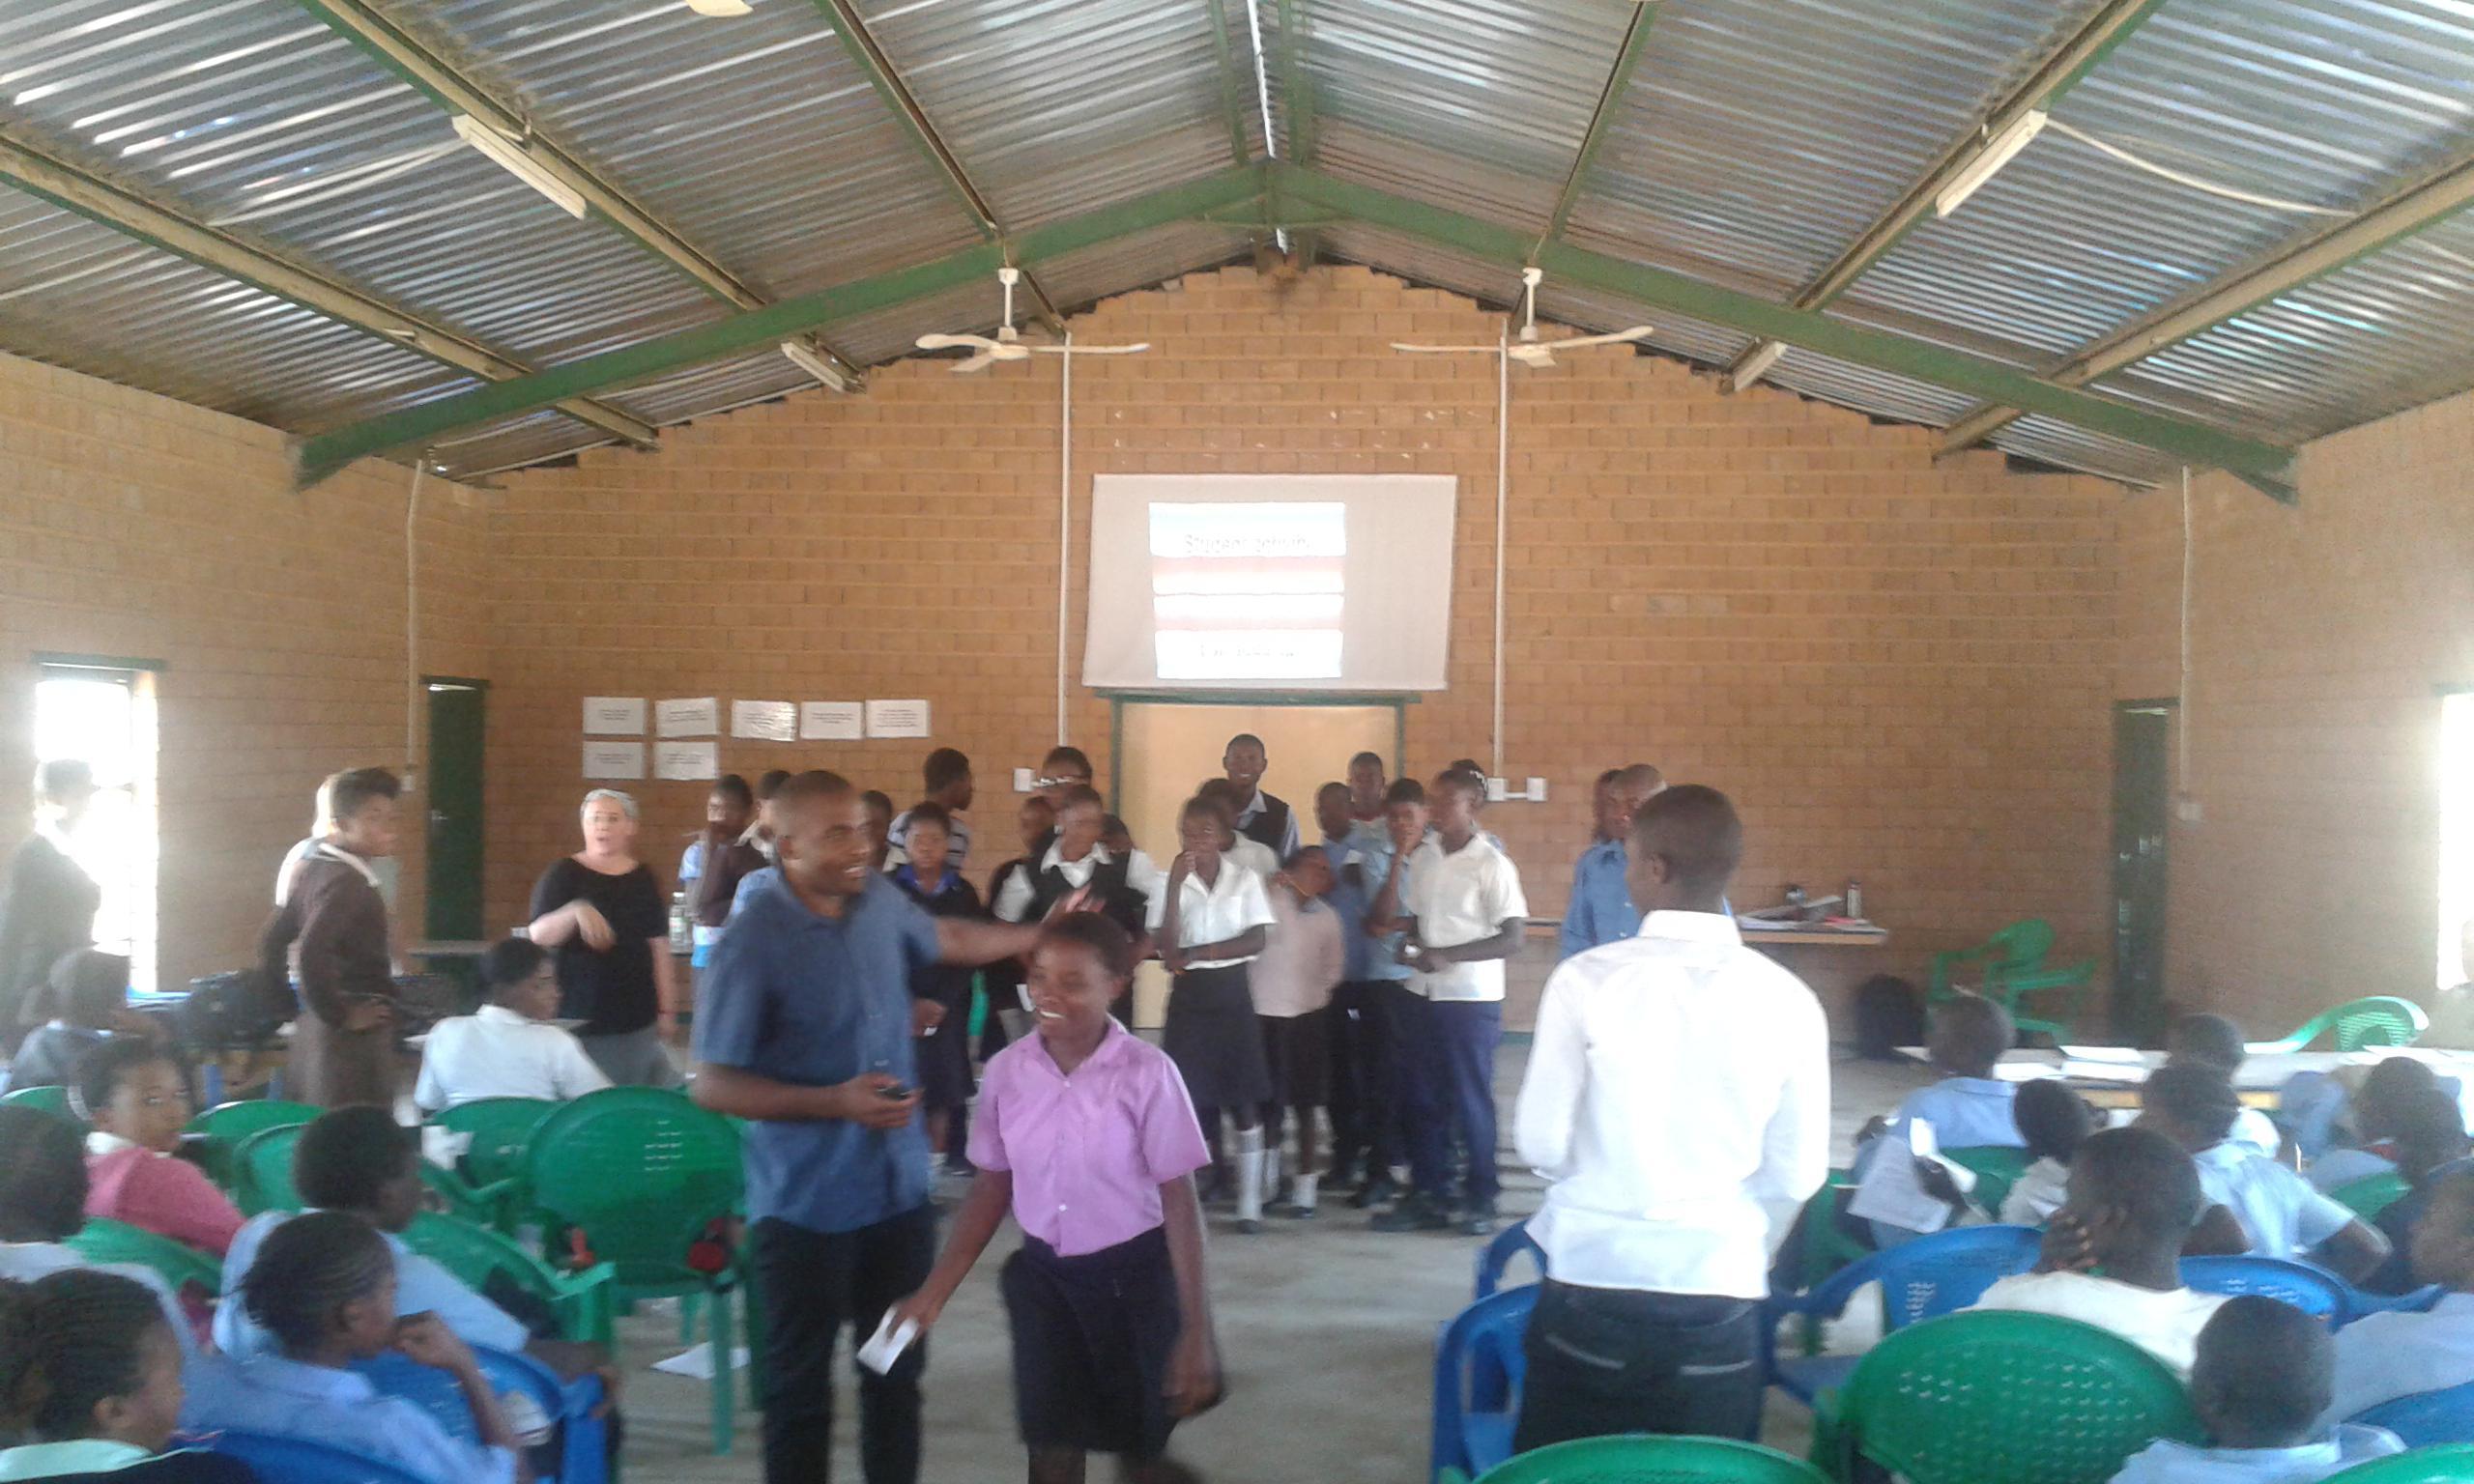 Village_of_Hope_Episcopal_school.jpg